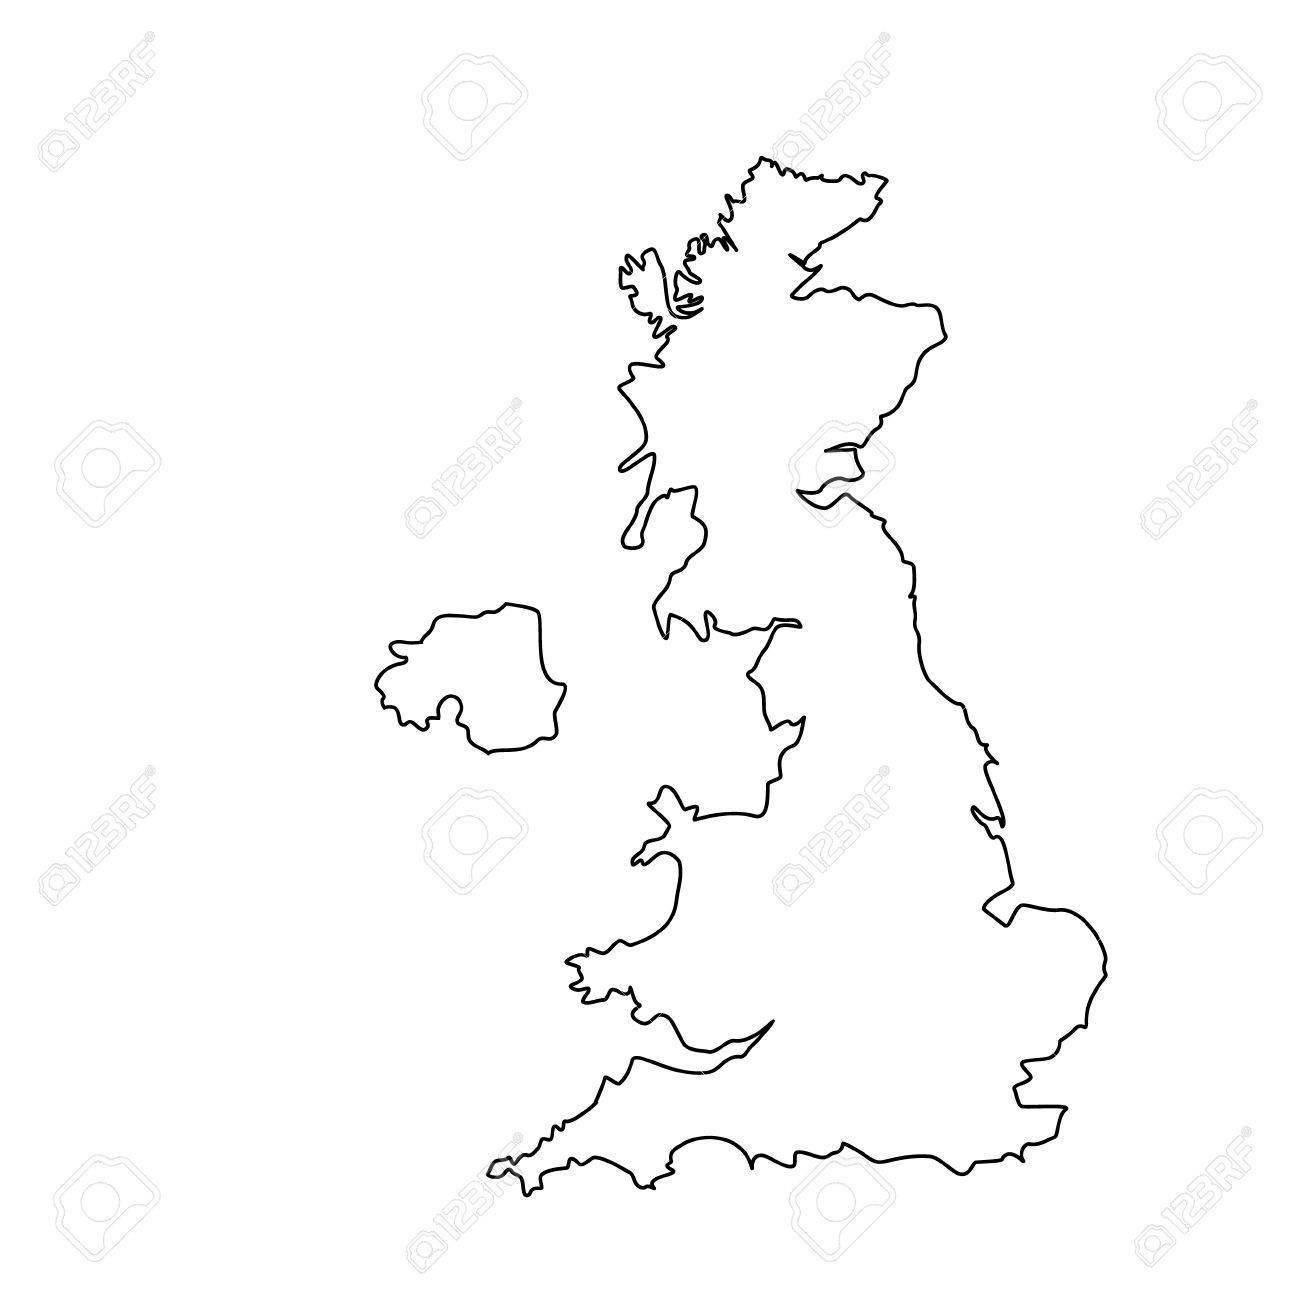 1300x1300 Raster Illustration Uk Map Outline Drawing. England Map Line